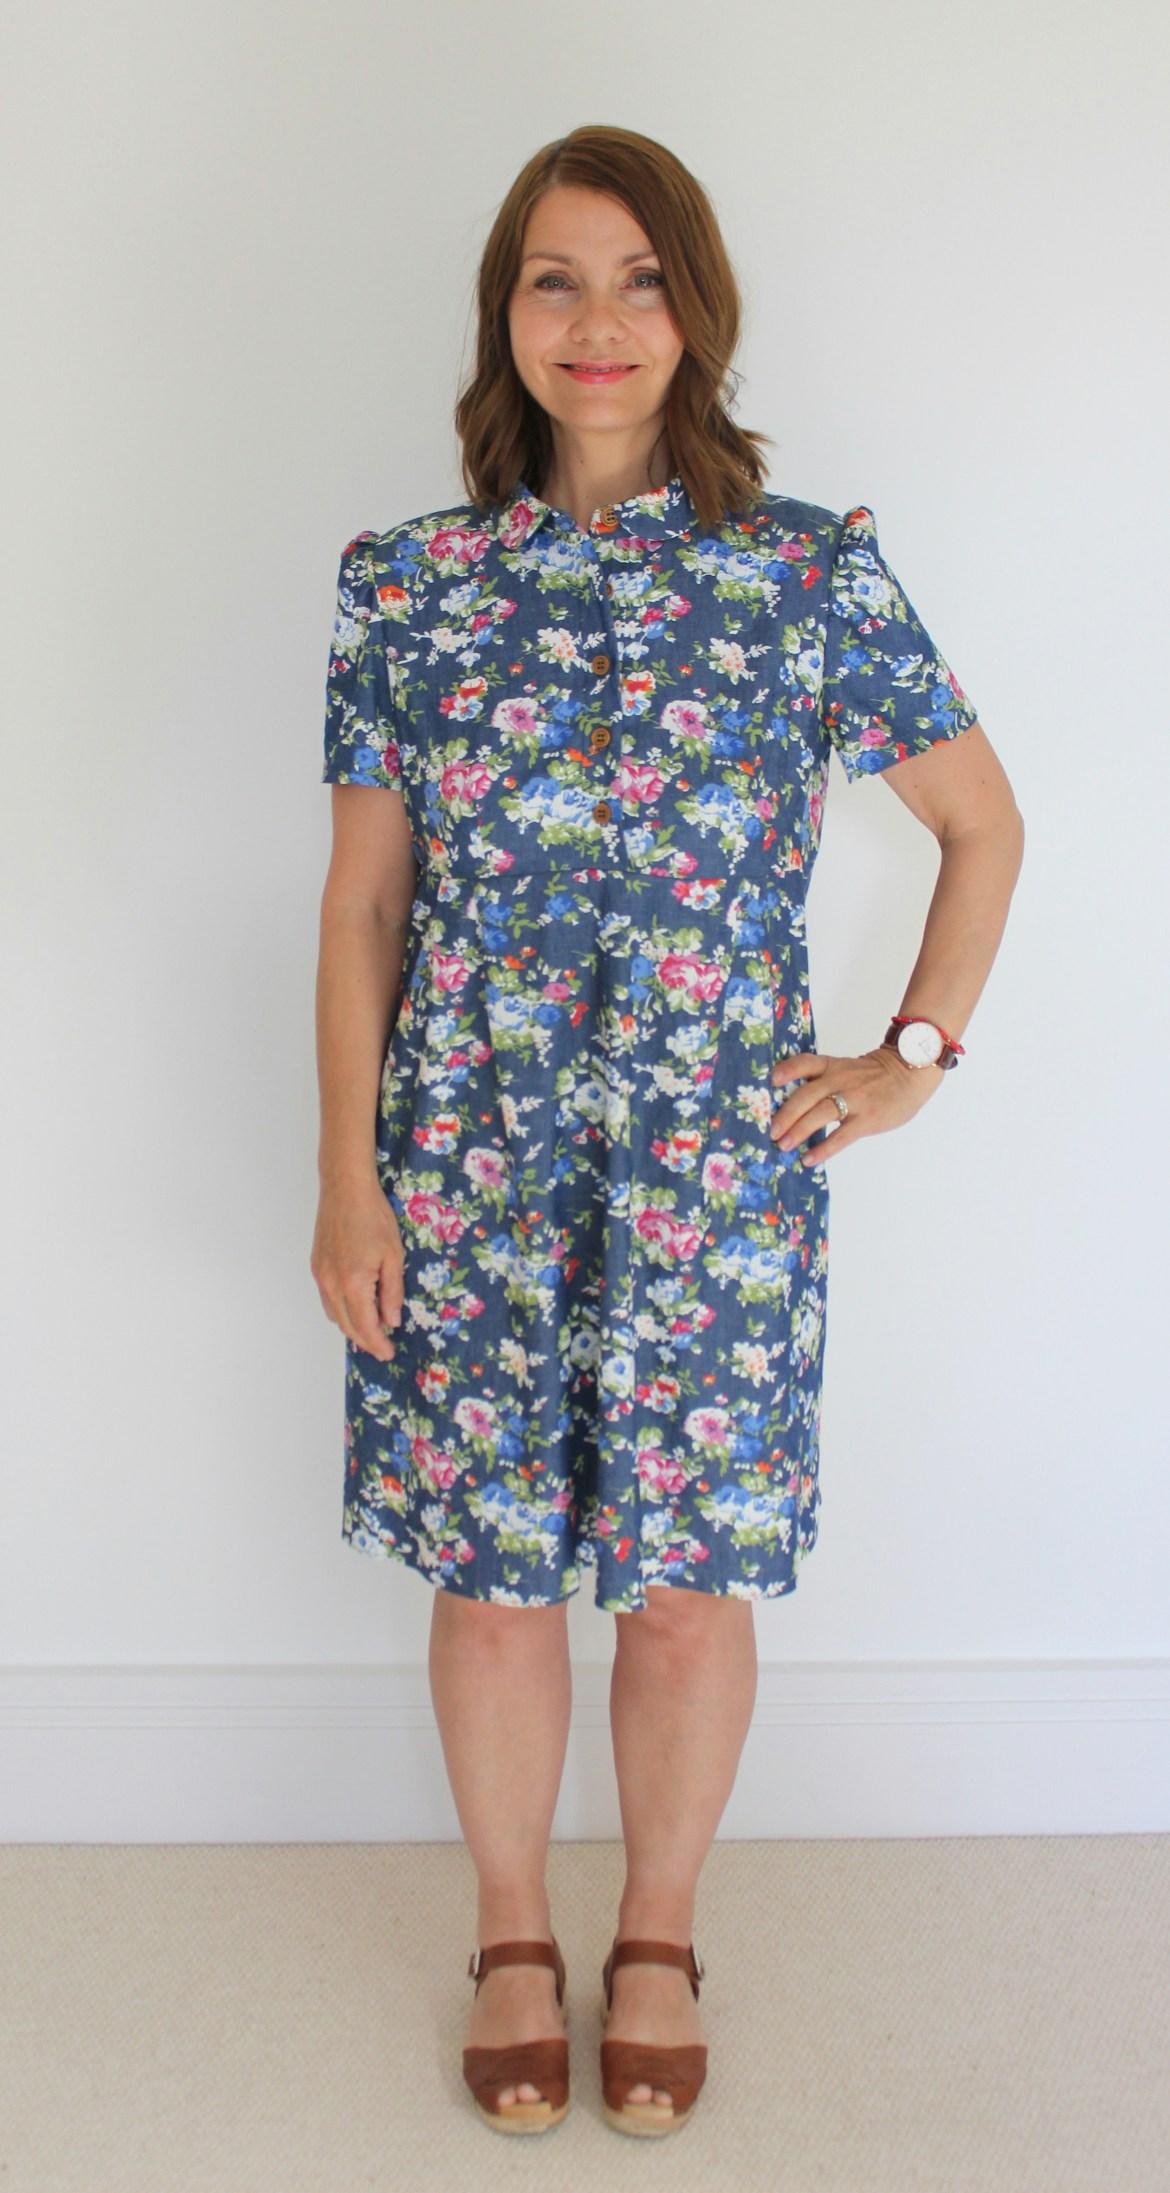 shirtdress10